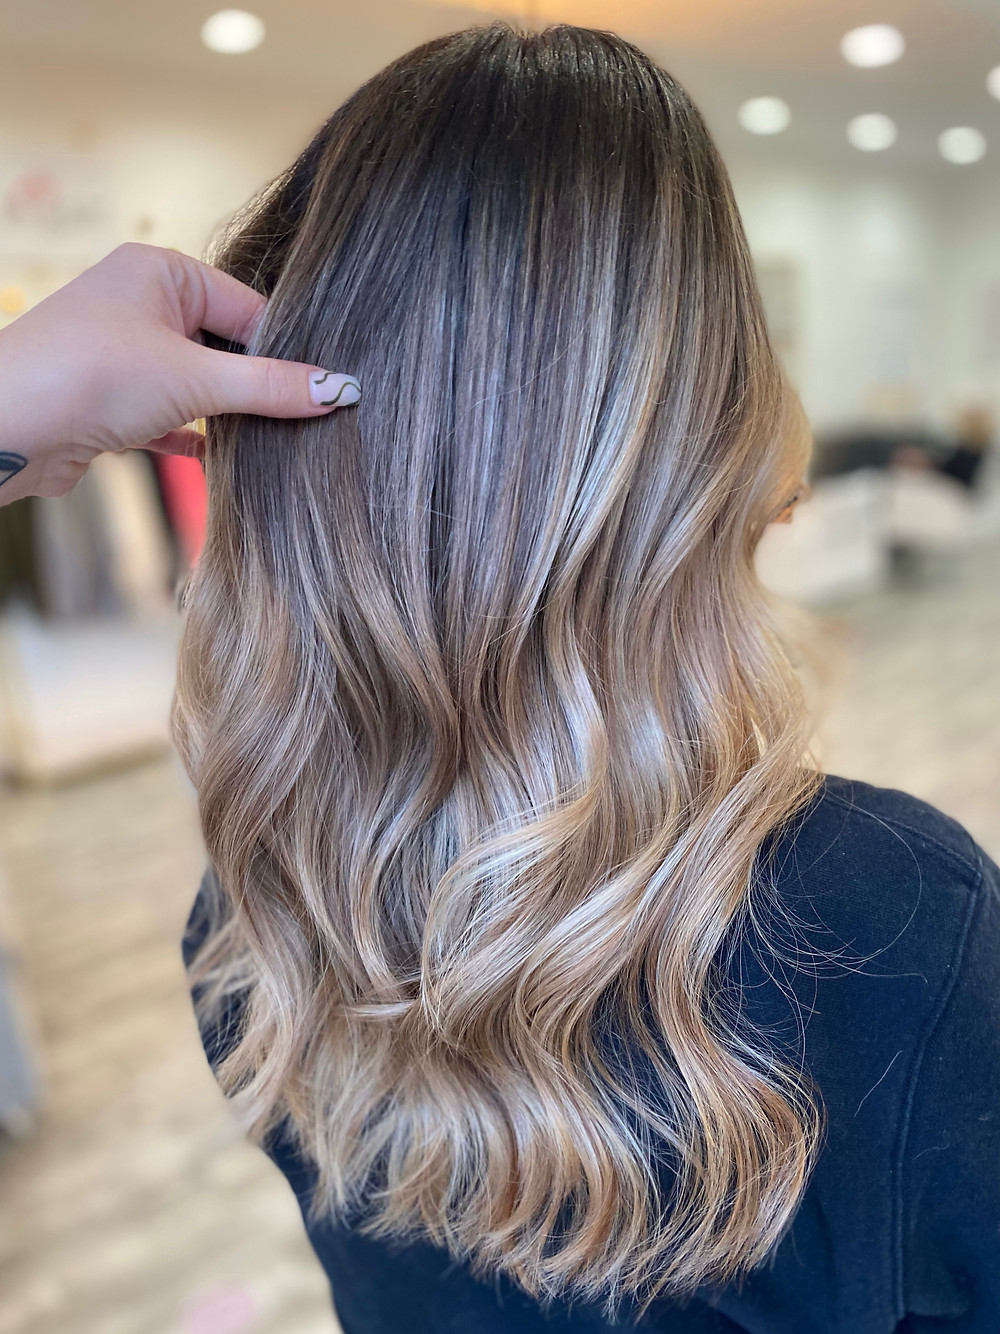 Full Balayage - Brunette to Soft Beige Blonde - Parma Ohio